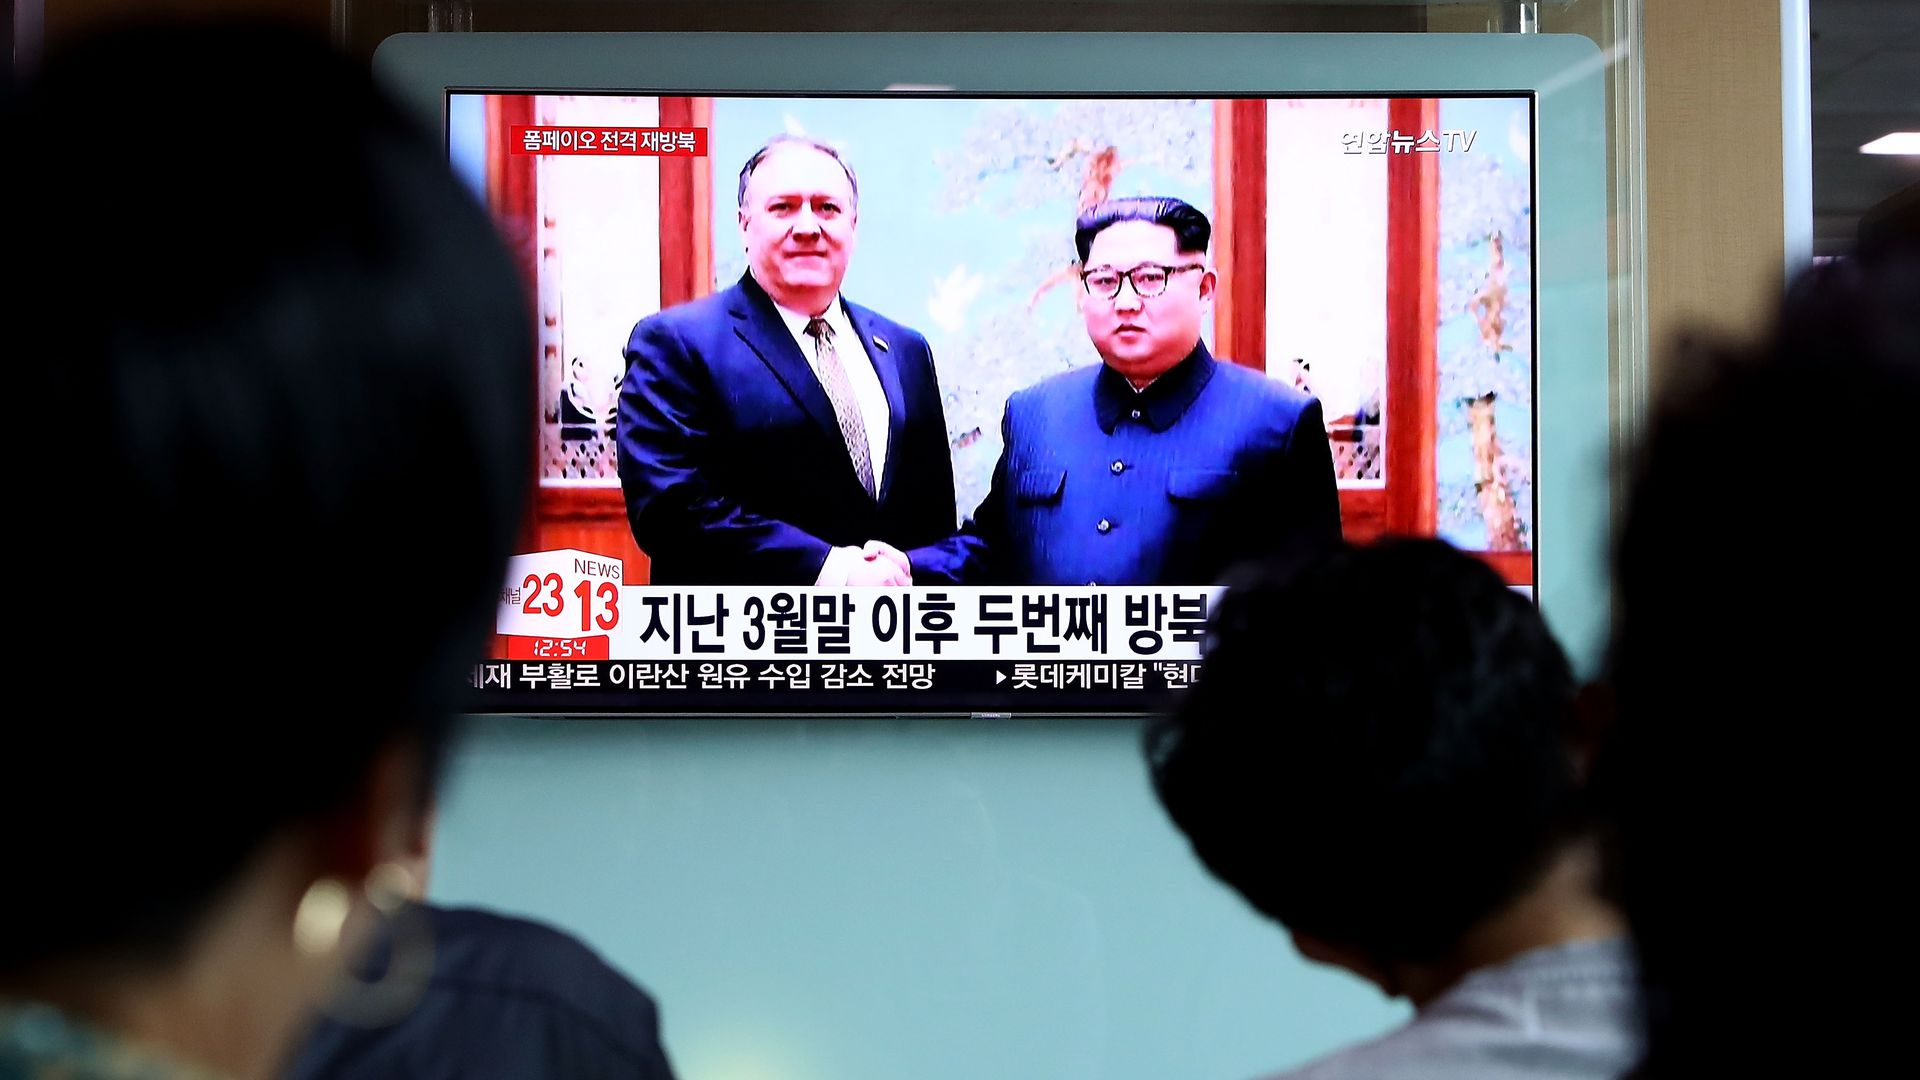 Pompeo and Kim on Korean TV